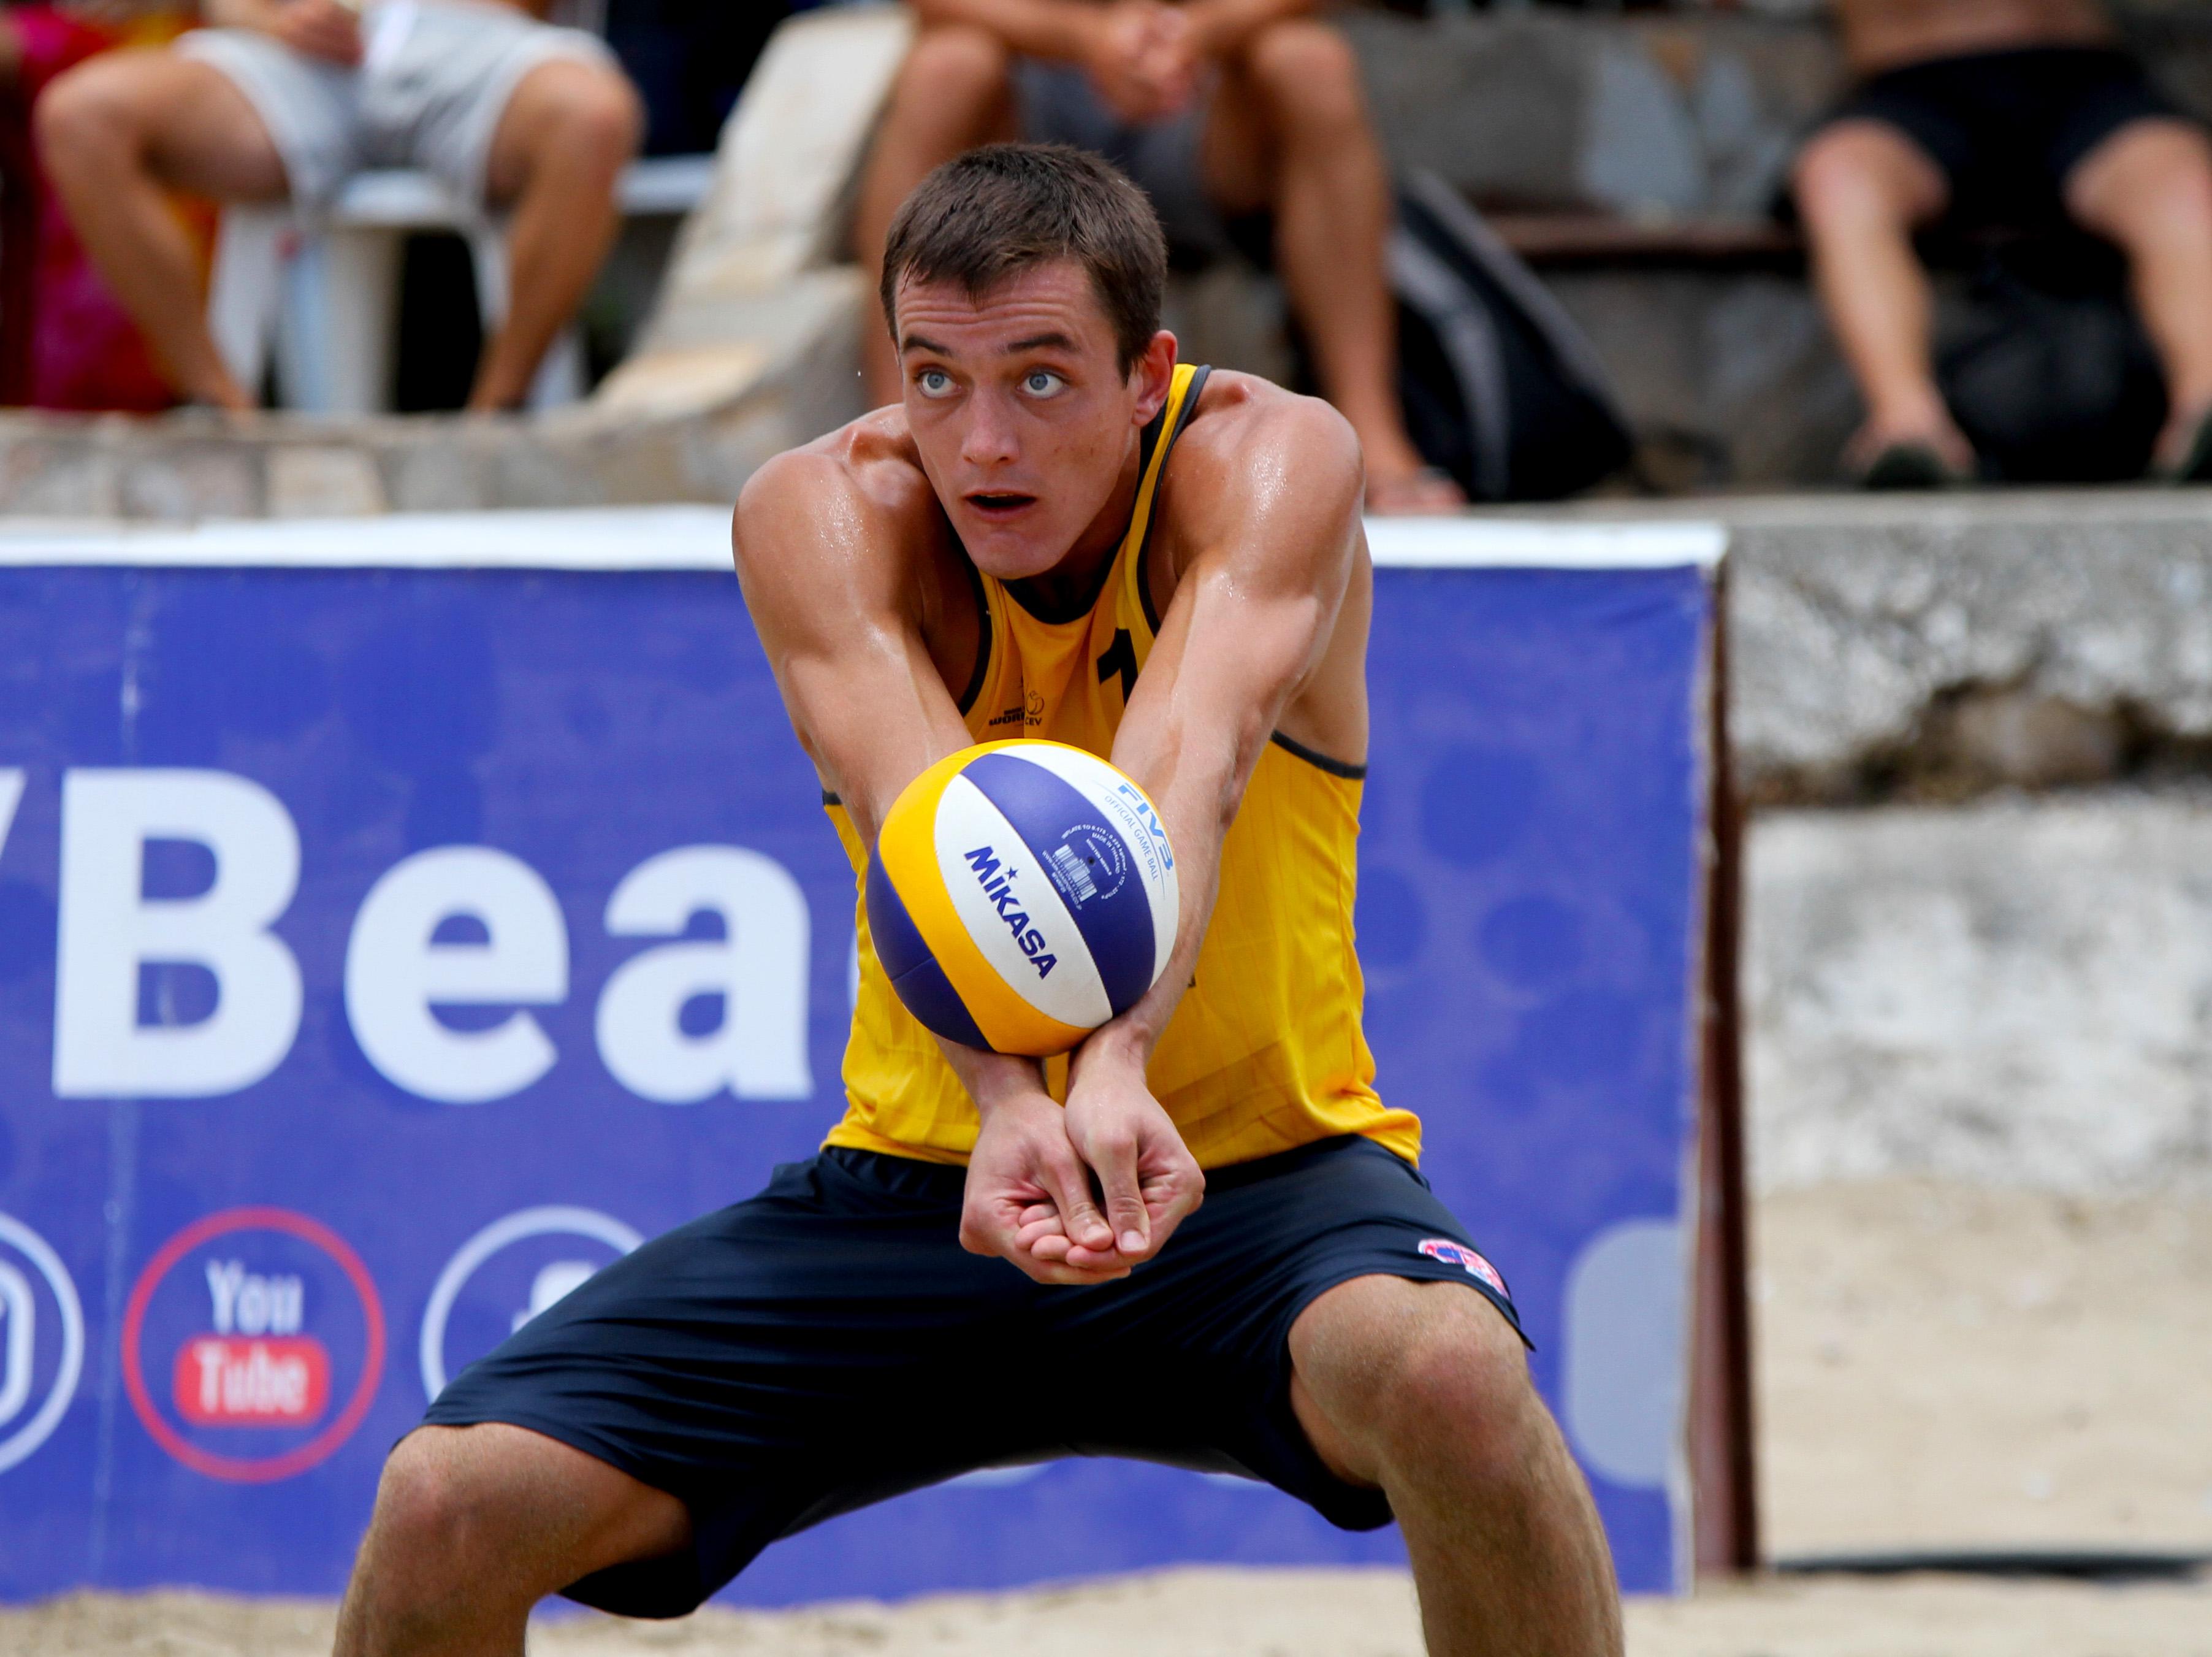 Volleyball training & vertical jump program. Wmv youtube.